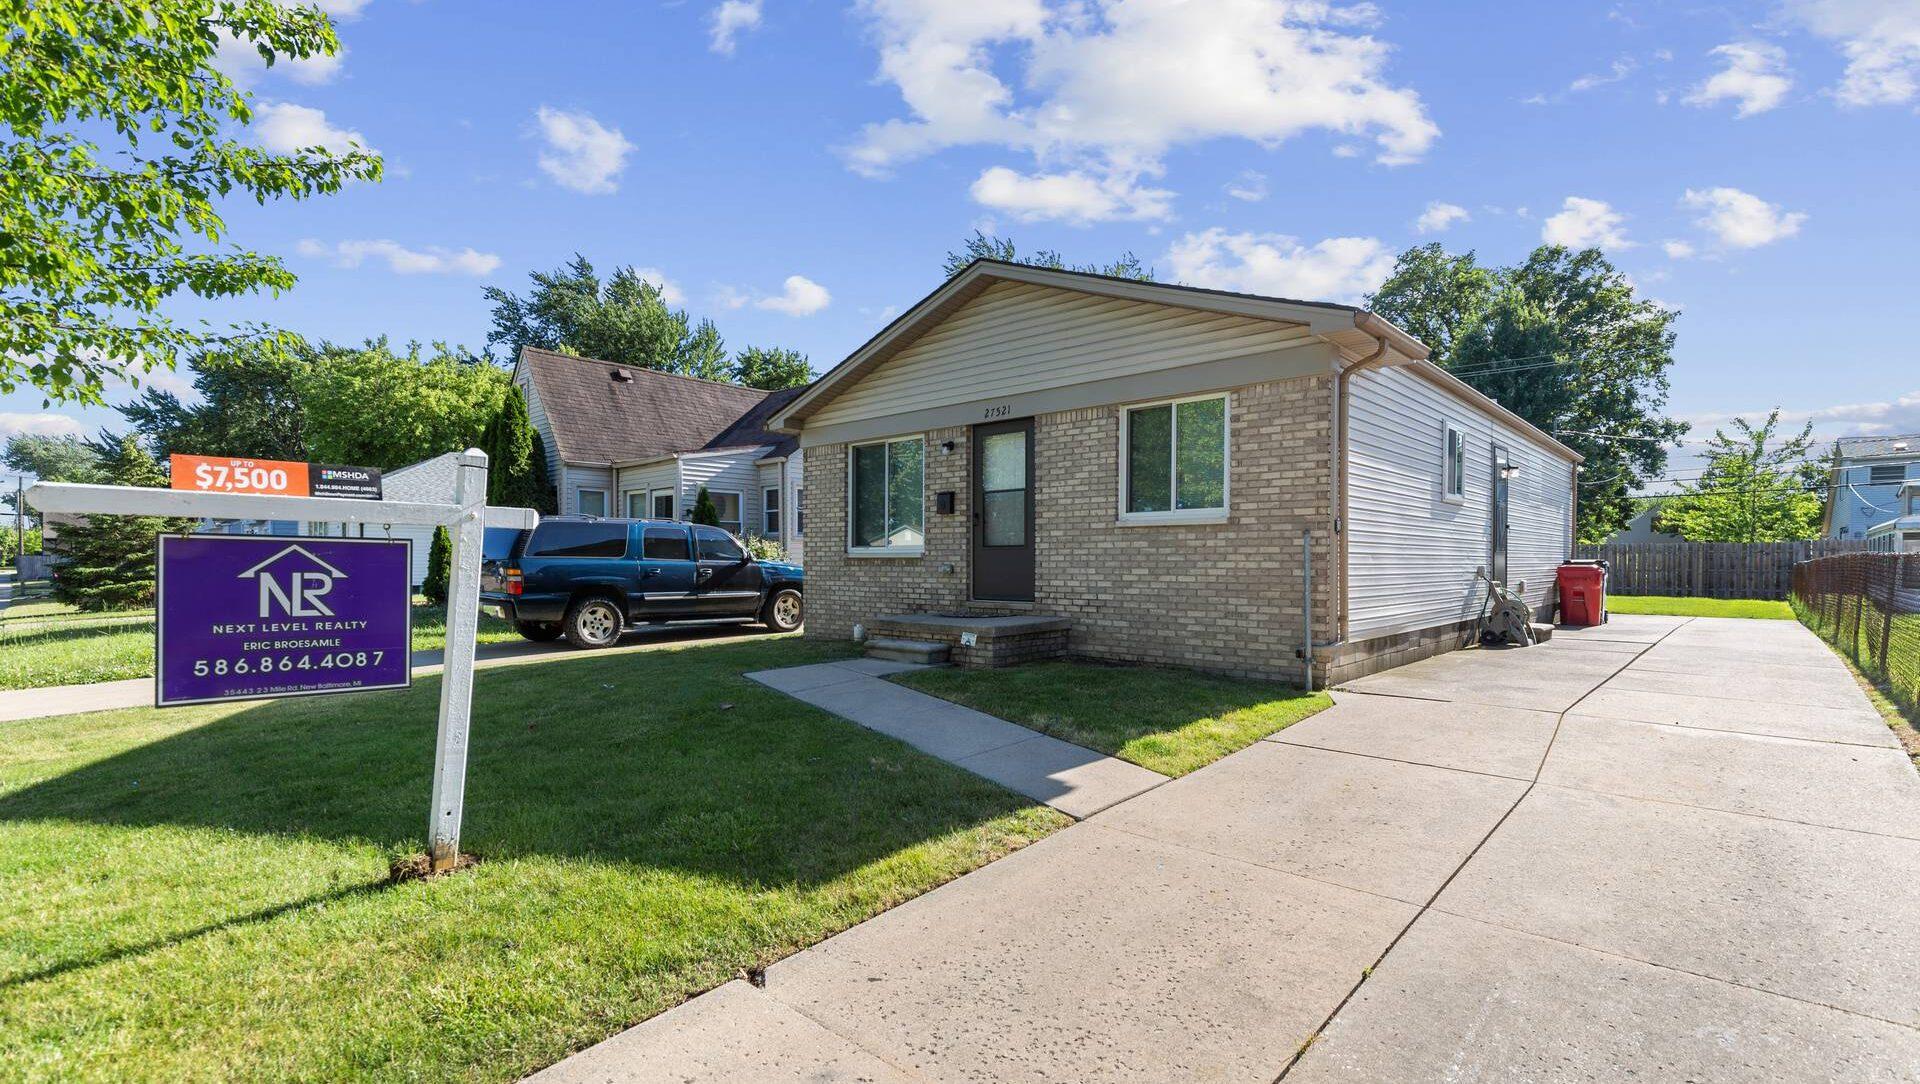 CLOSED – 27521 Tighe St. Roseville 48066